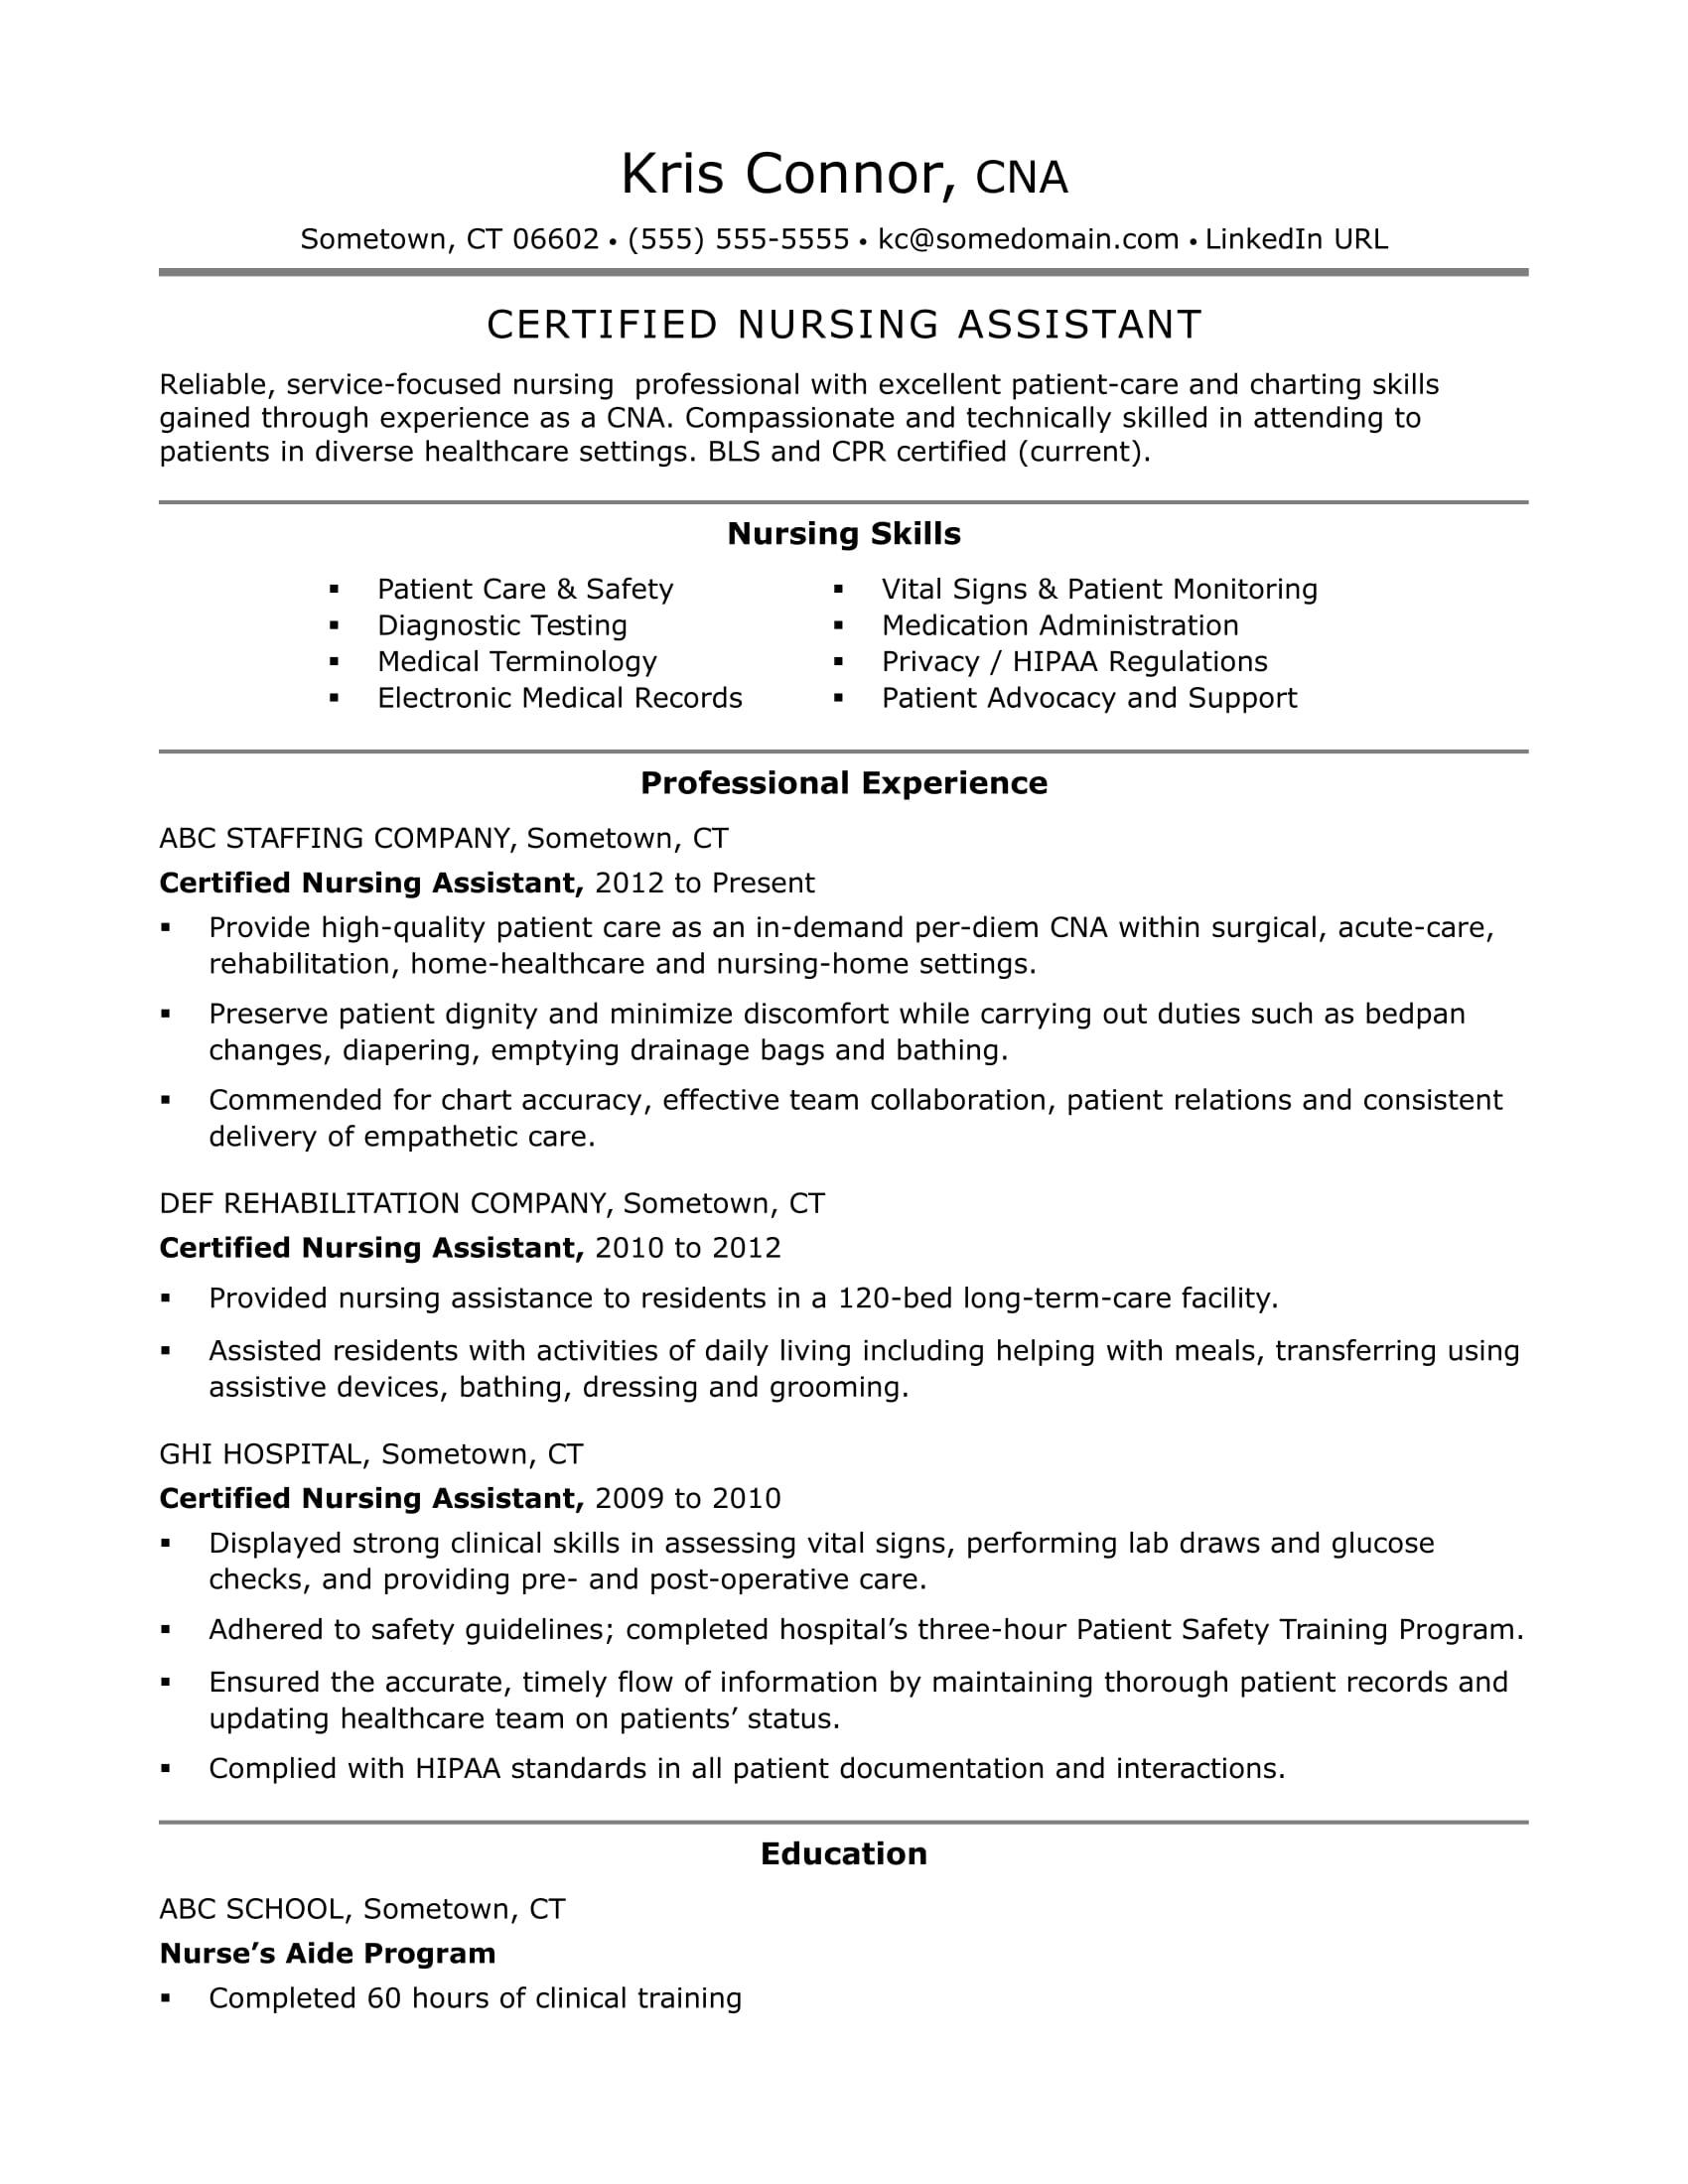 key skills for cna resume